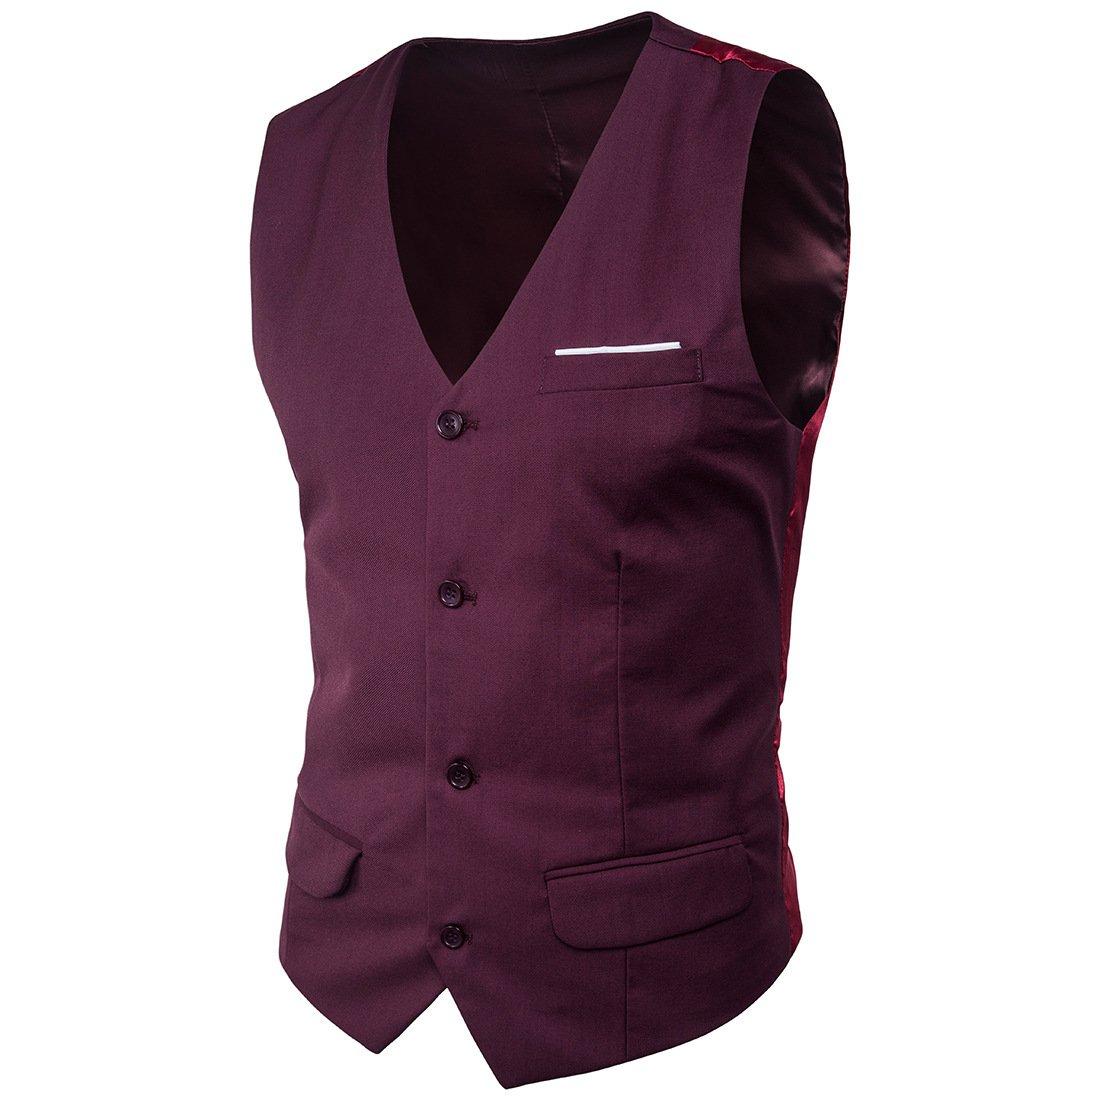 7dress Men's Slim Fit Suit Vests V-Neck Formal Business Sleeveless Dress Bridegroom Suit Separate Waistcoat by 7dress (Image #2)